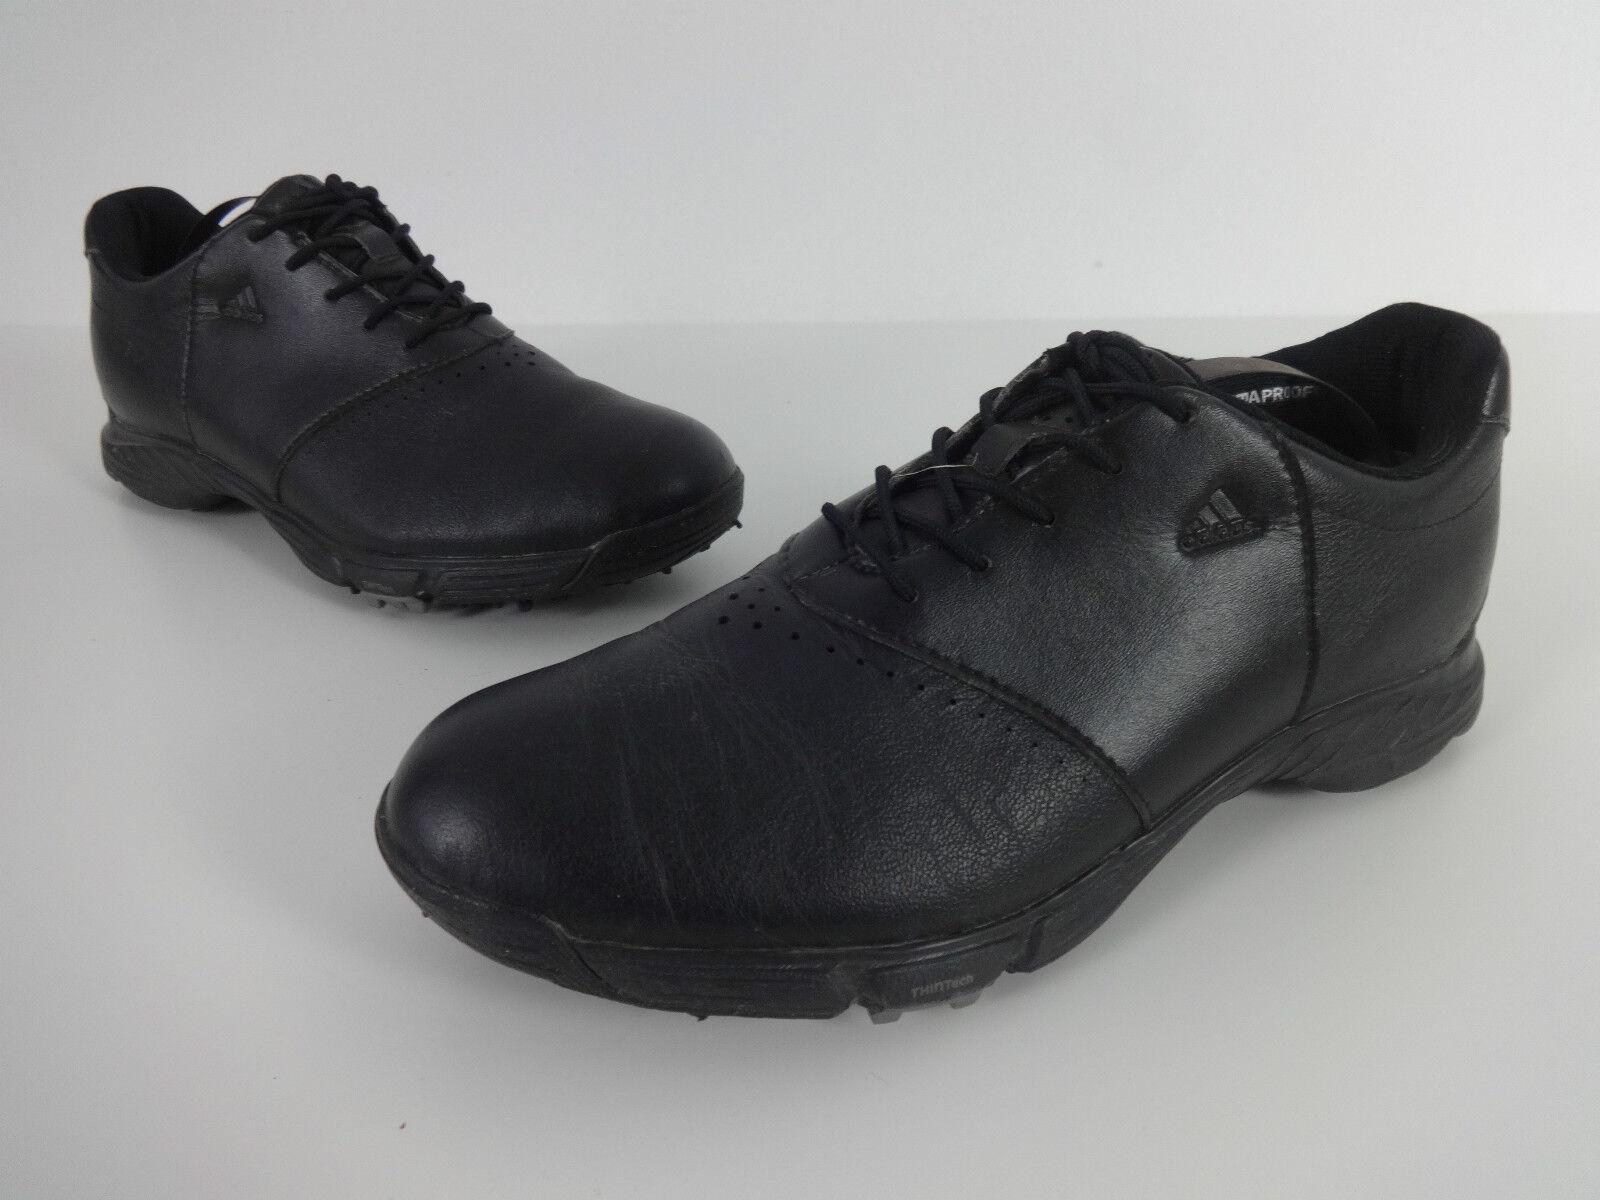 Adidas Golf Spikes 5 UK Μαύρο ΔΡρμάτινο Climaproof Traxion ΔαντέλΡς μέχρι τα γυναικΡία EUR 38